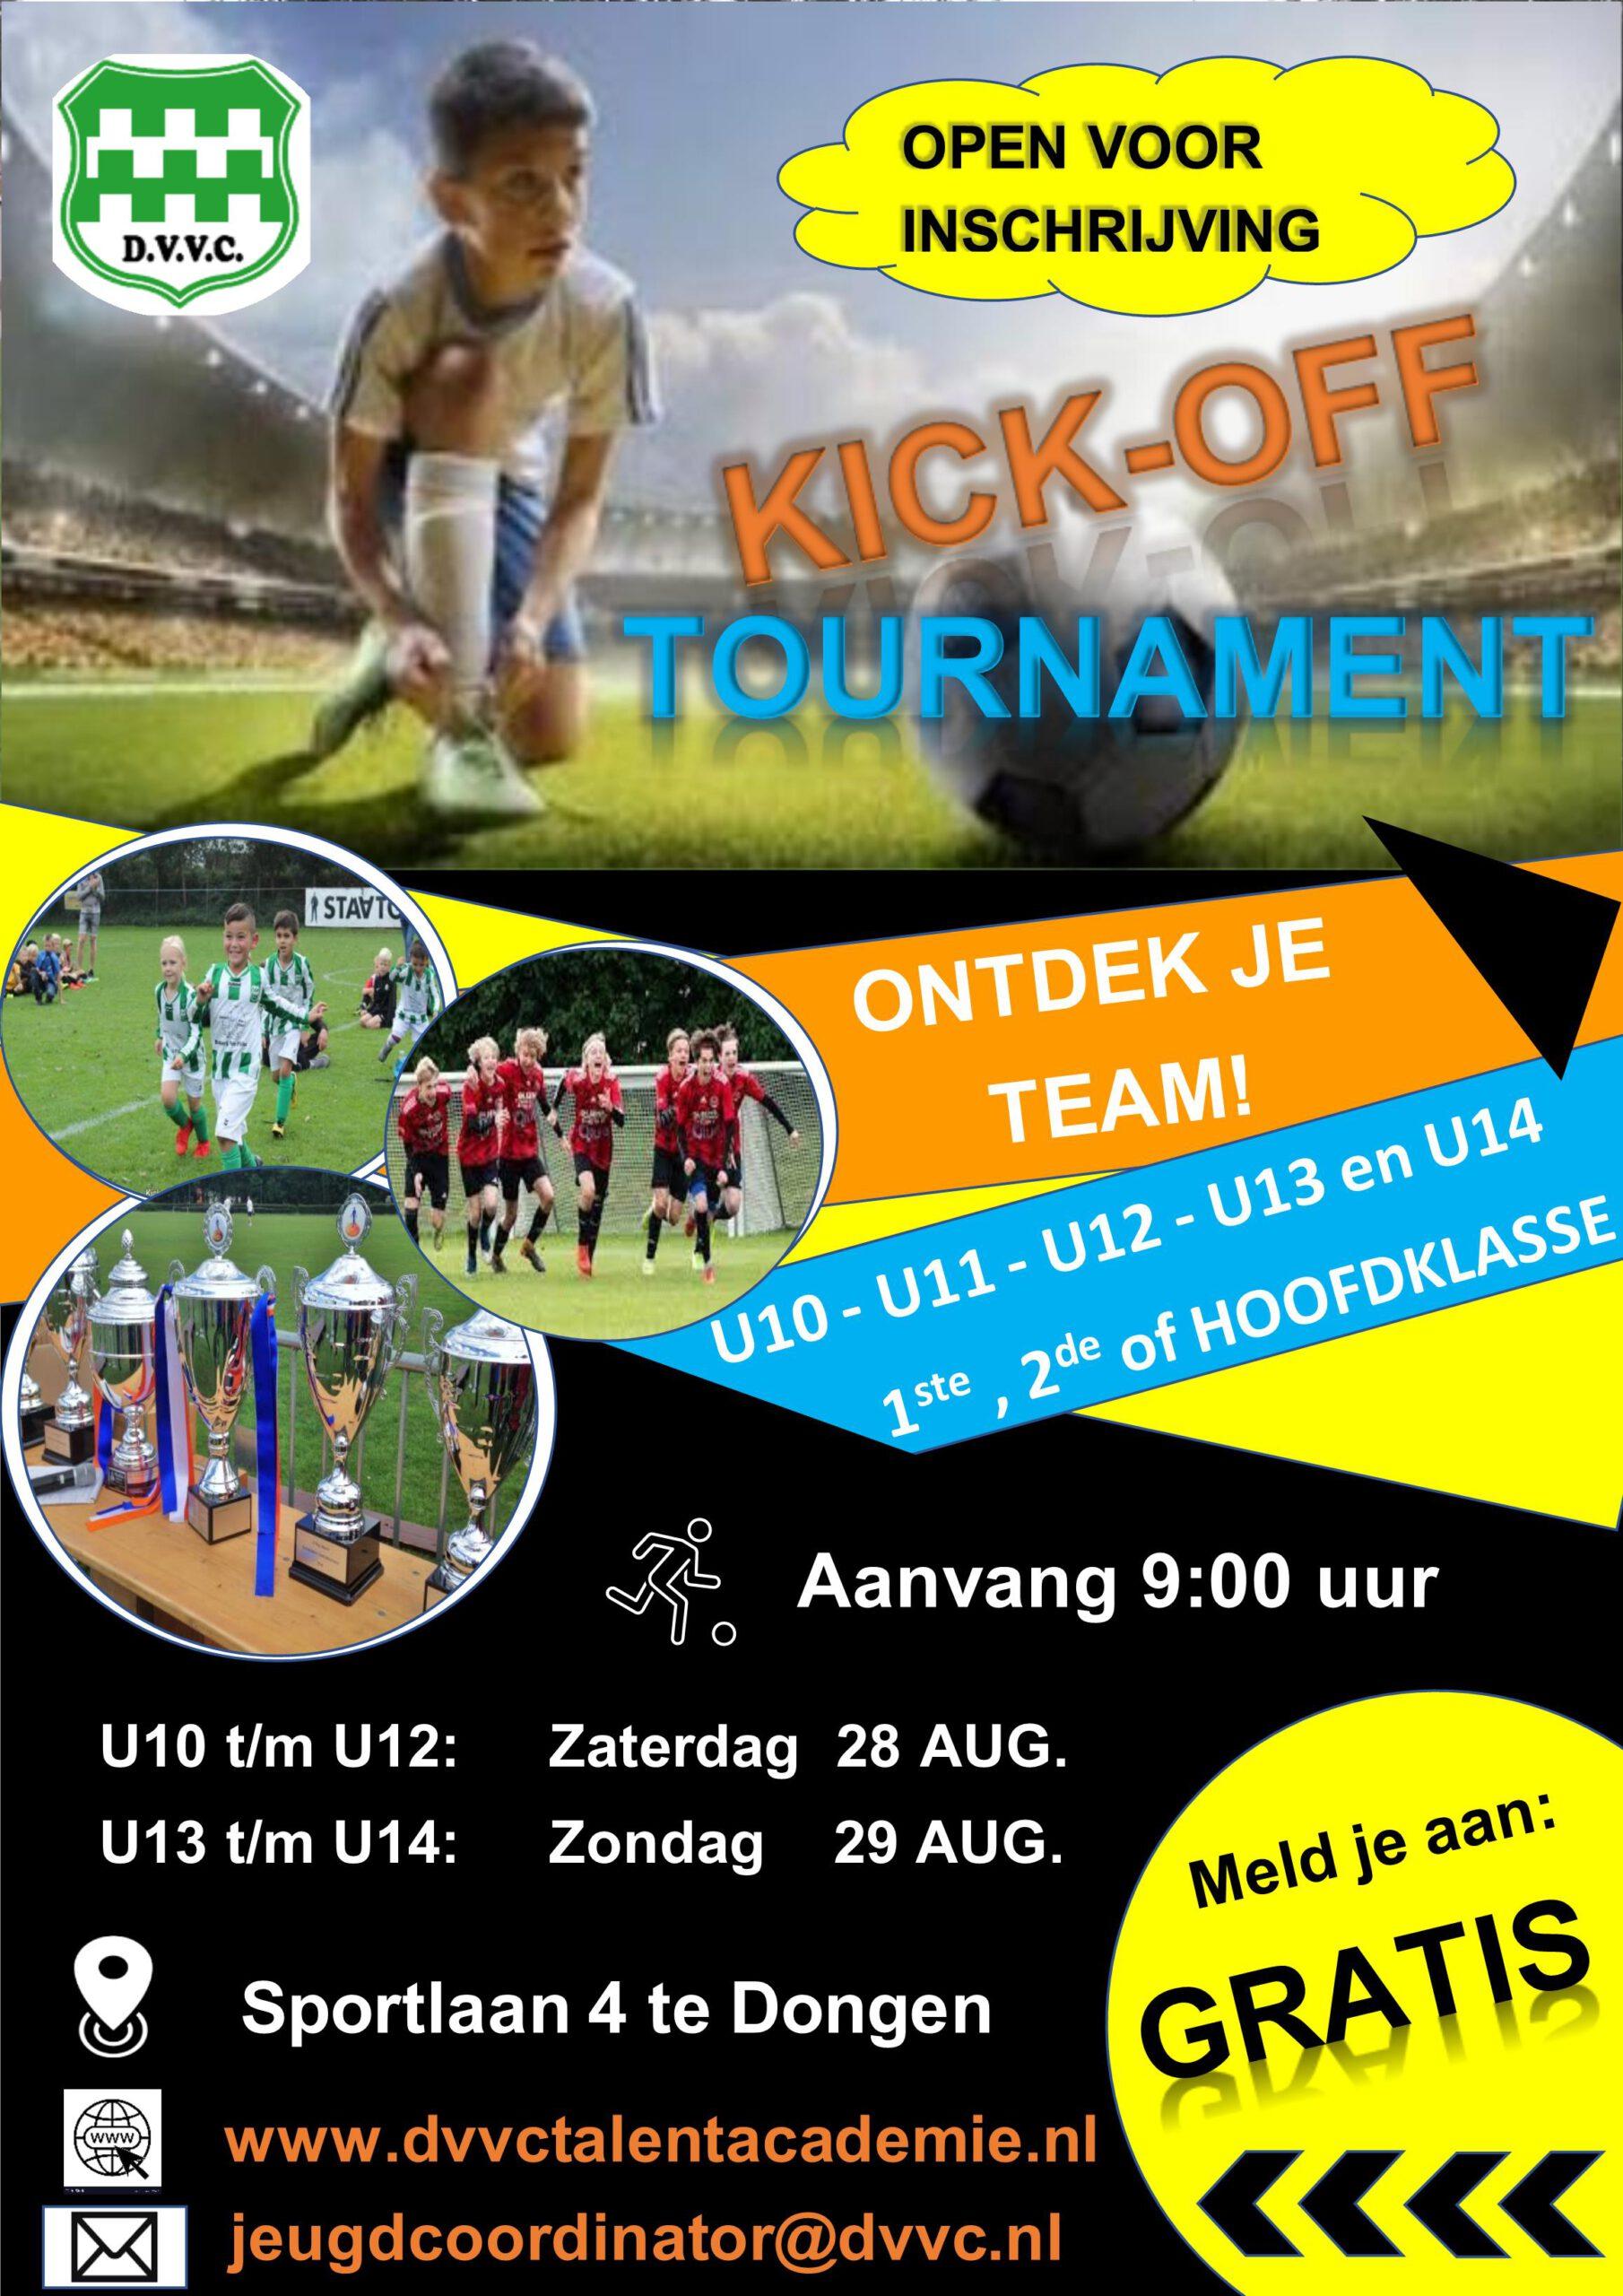 KICK Off tournament